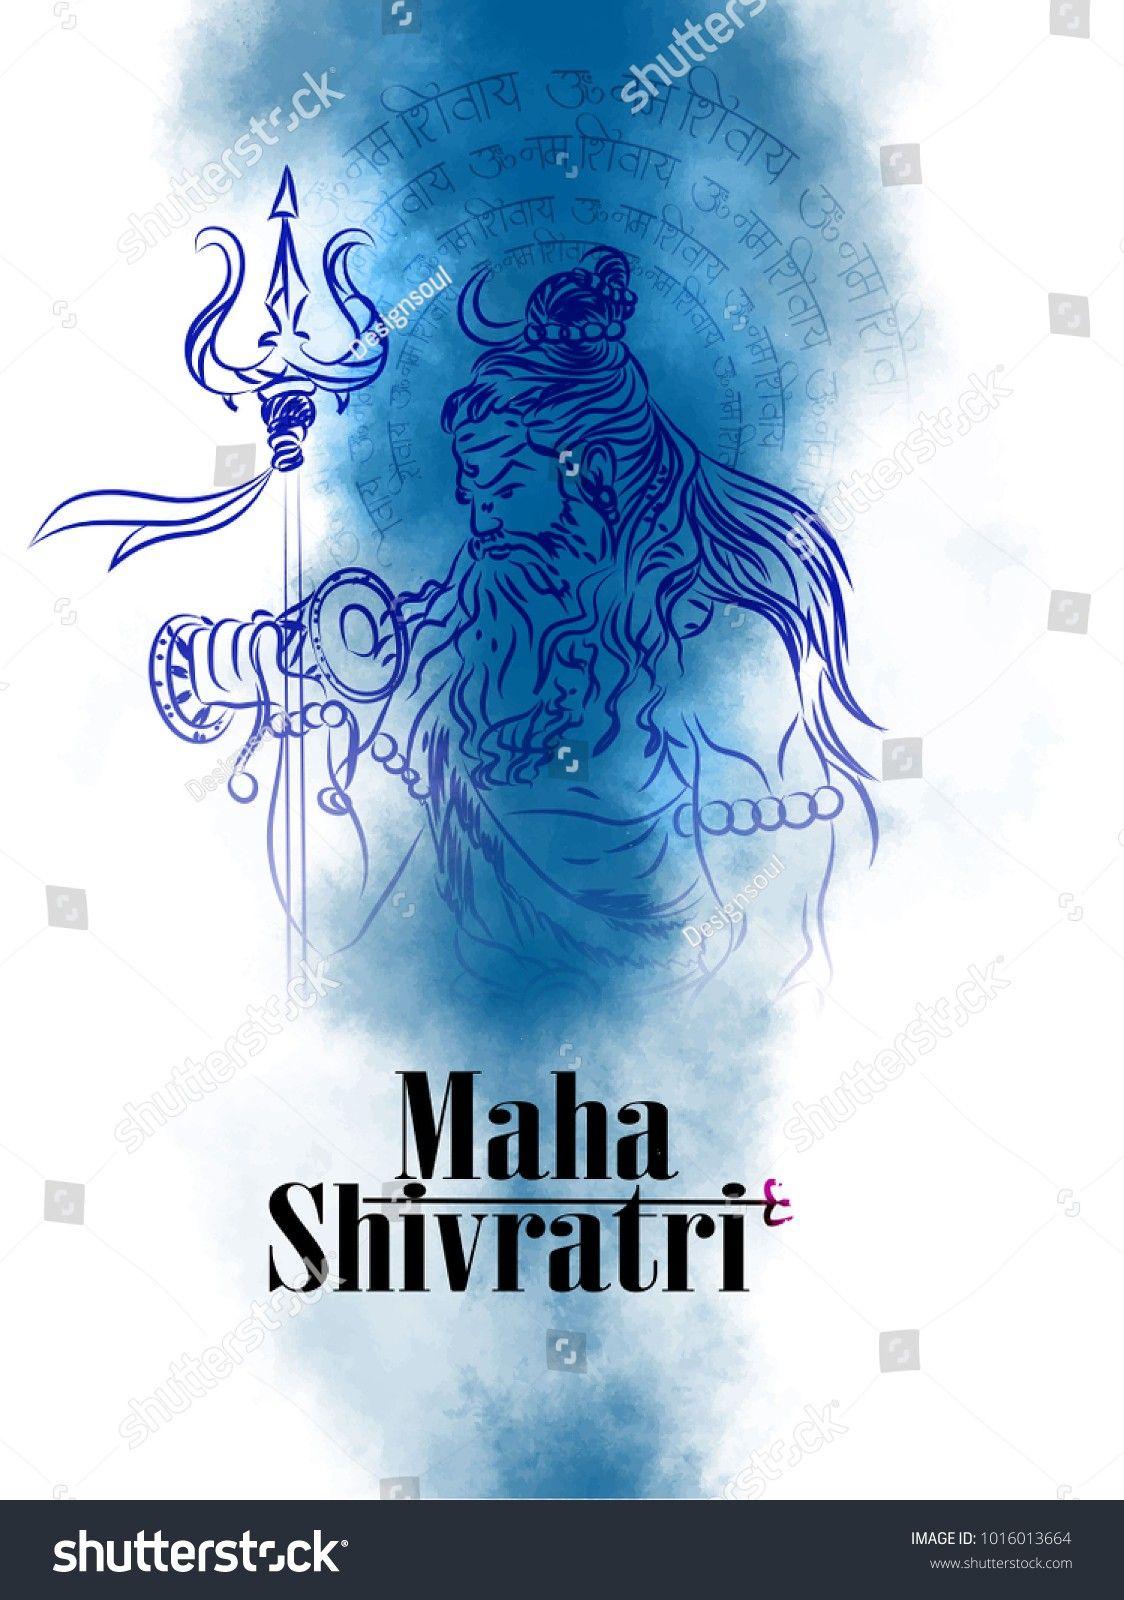 BAM भोले Shivratri wallpaper, Lord shiva hd wallpaper